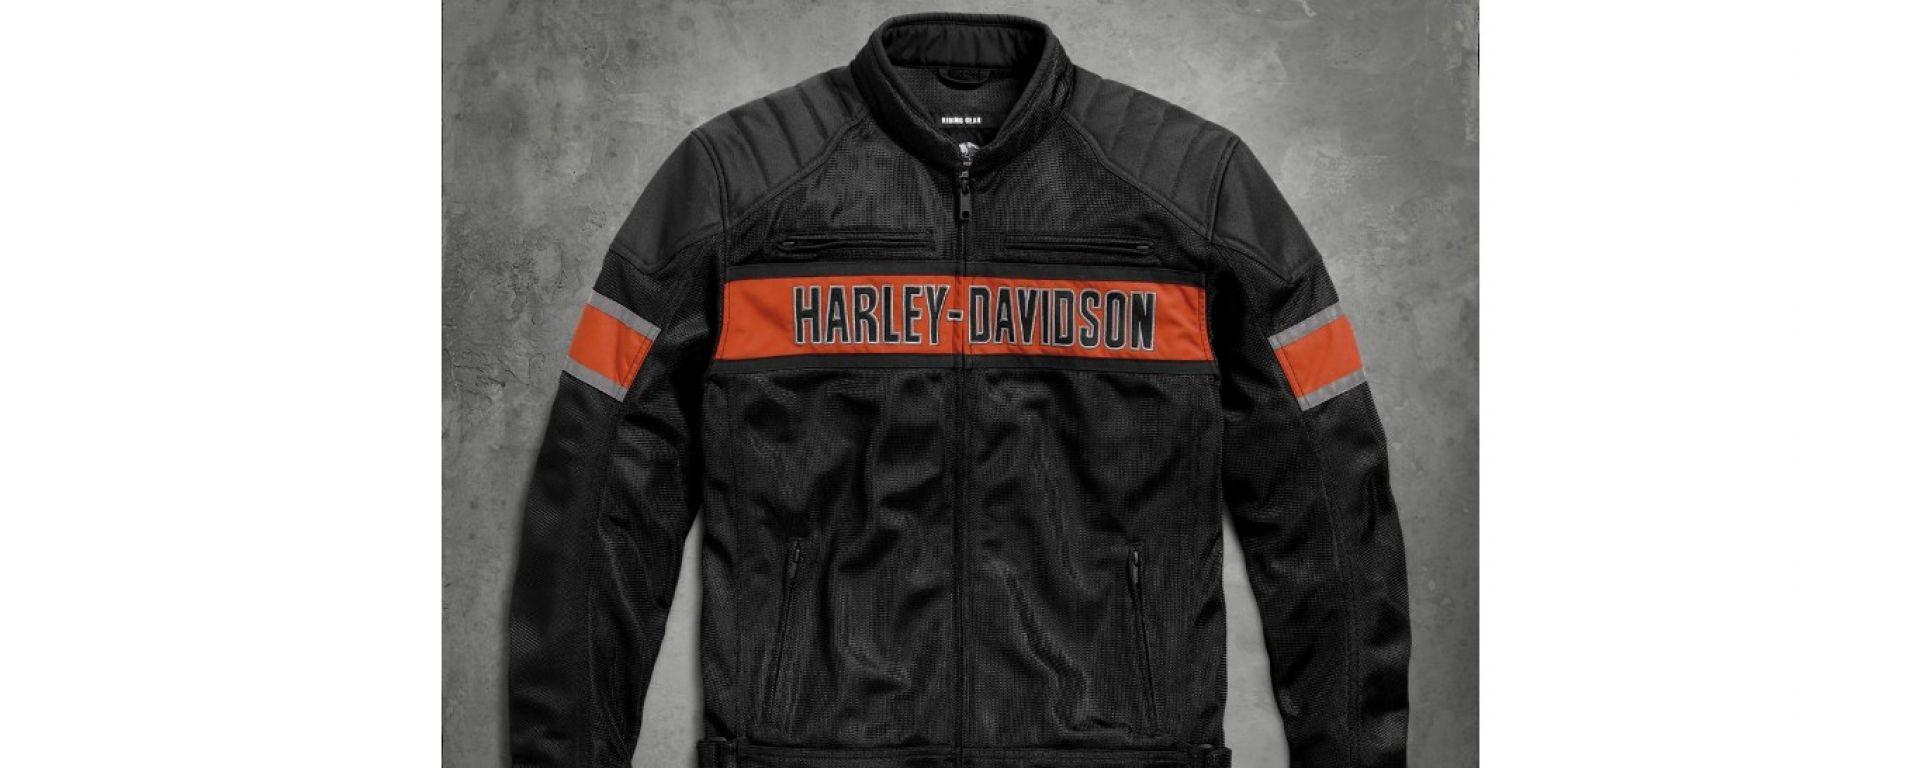 Natale Rocn'nRoll con Harley-Davidson